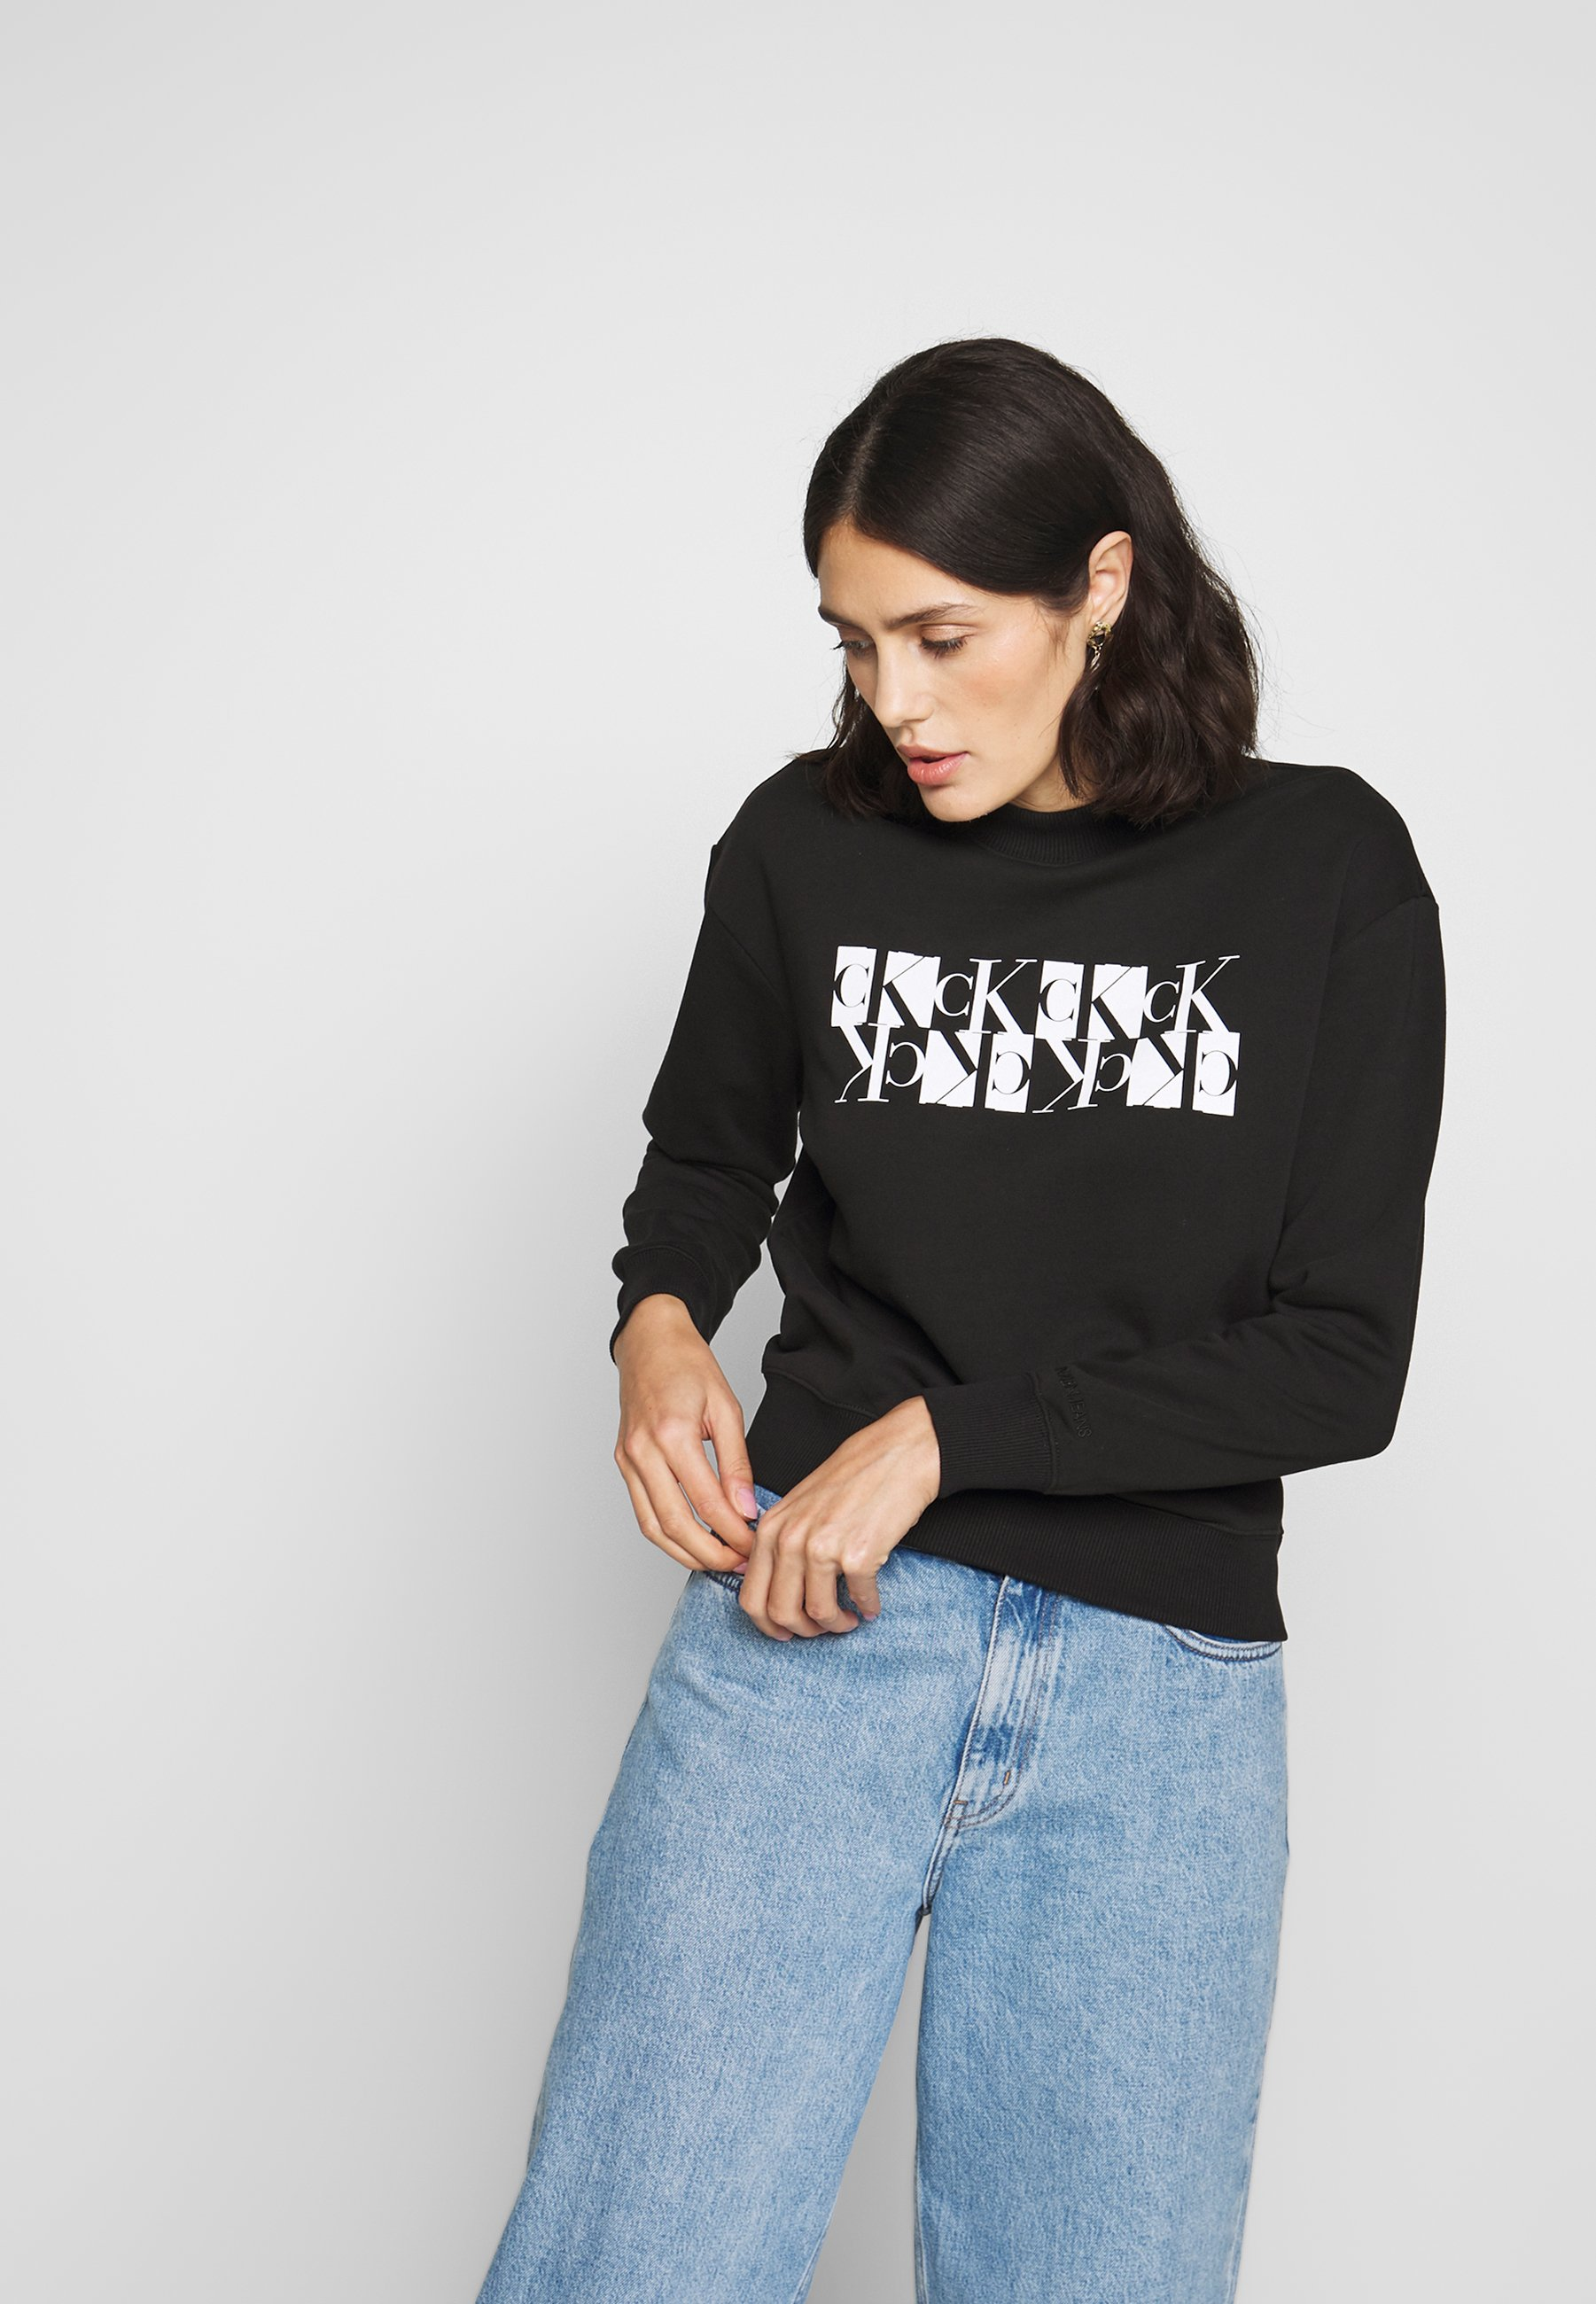 Calvin Klein Jeans Mirrored Crew Neck - Sweater Black 8GJjfWTw